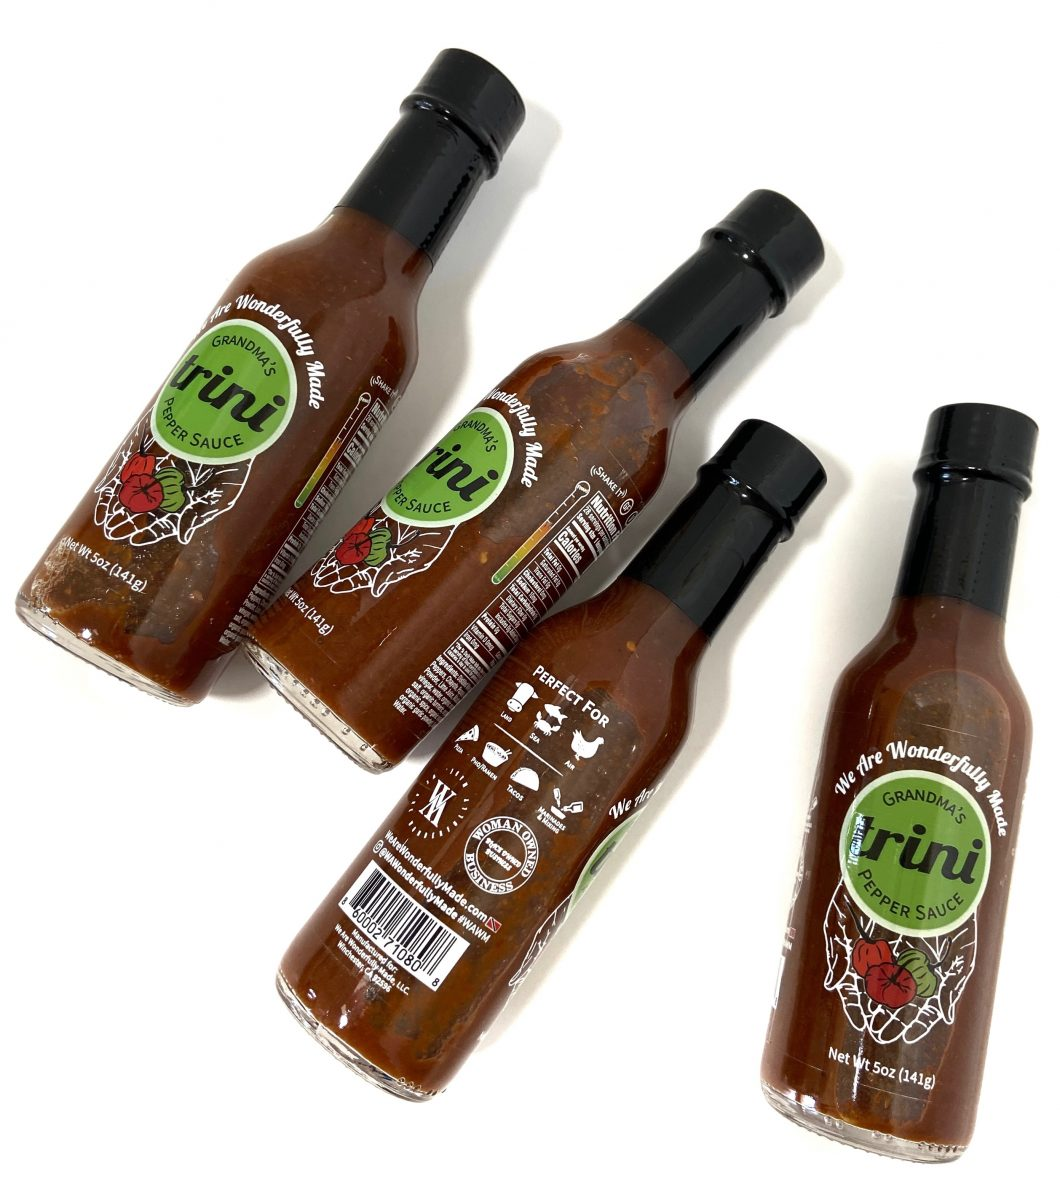 Grandma's Trini Pepper Sauce